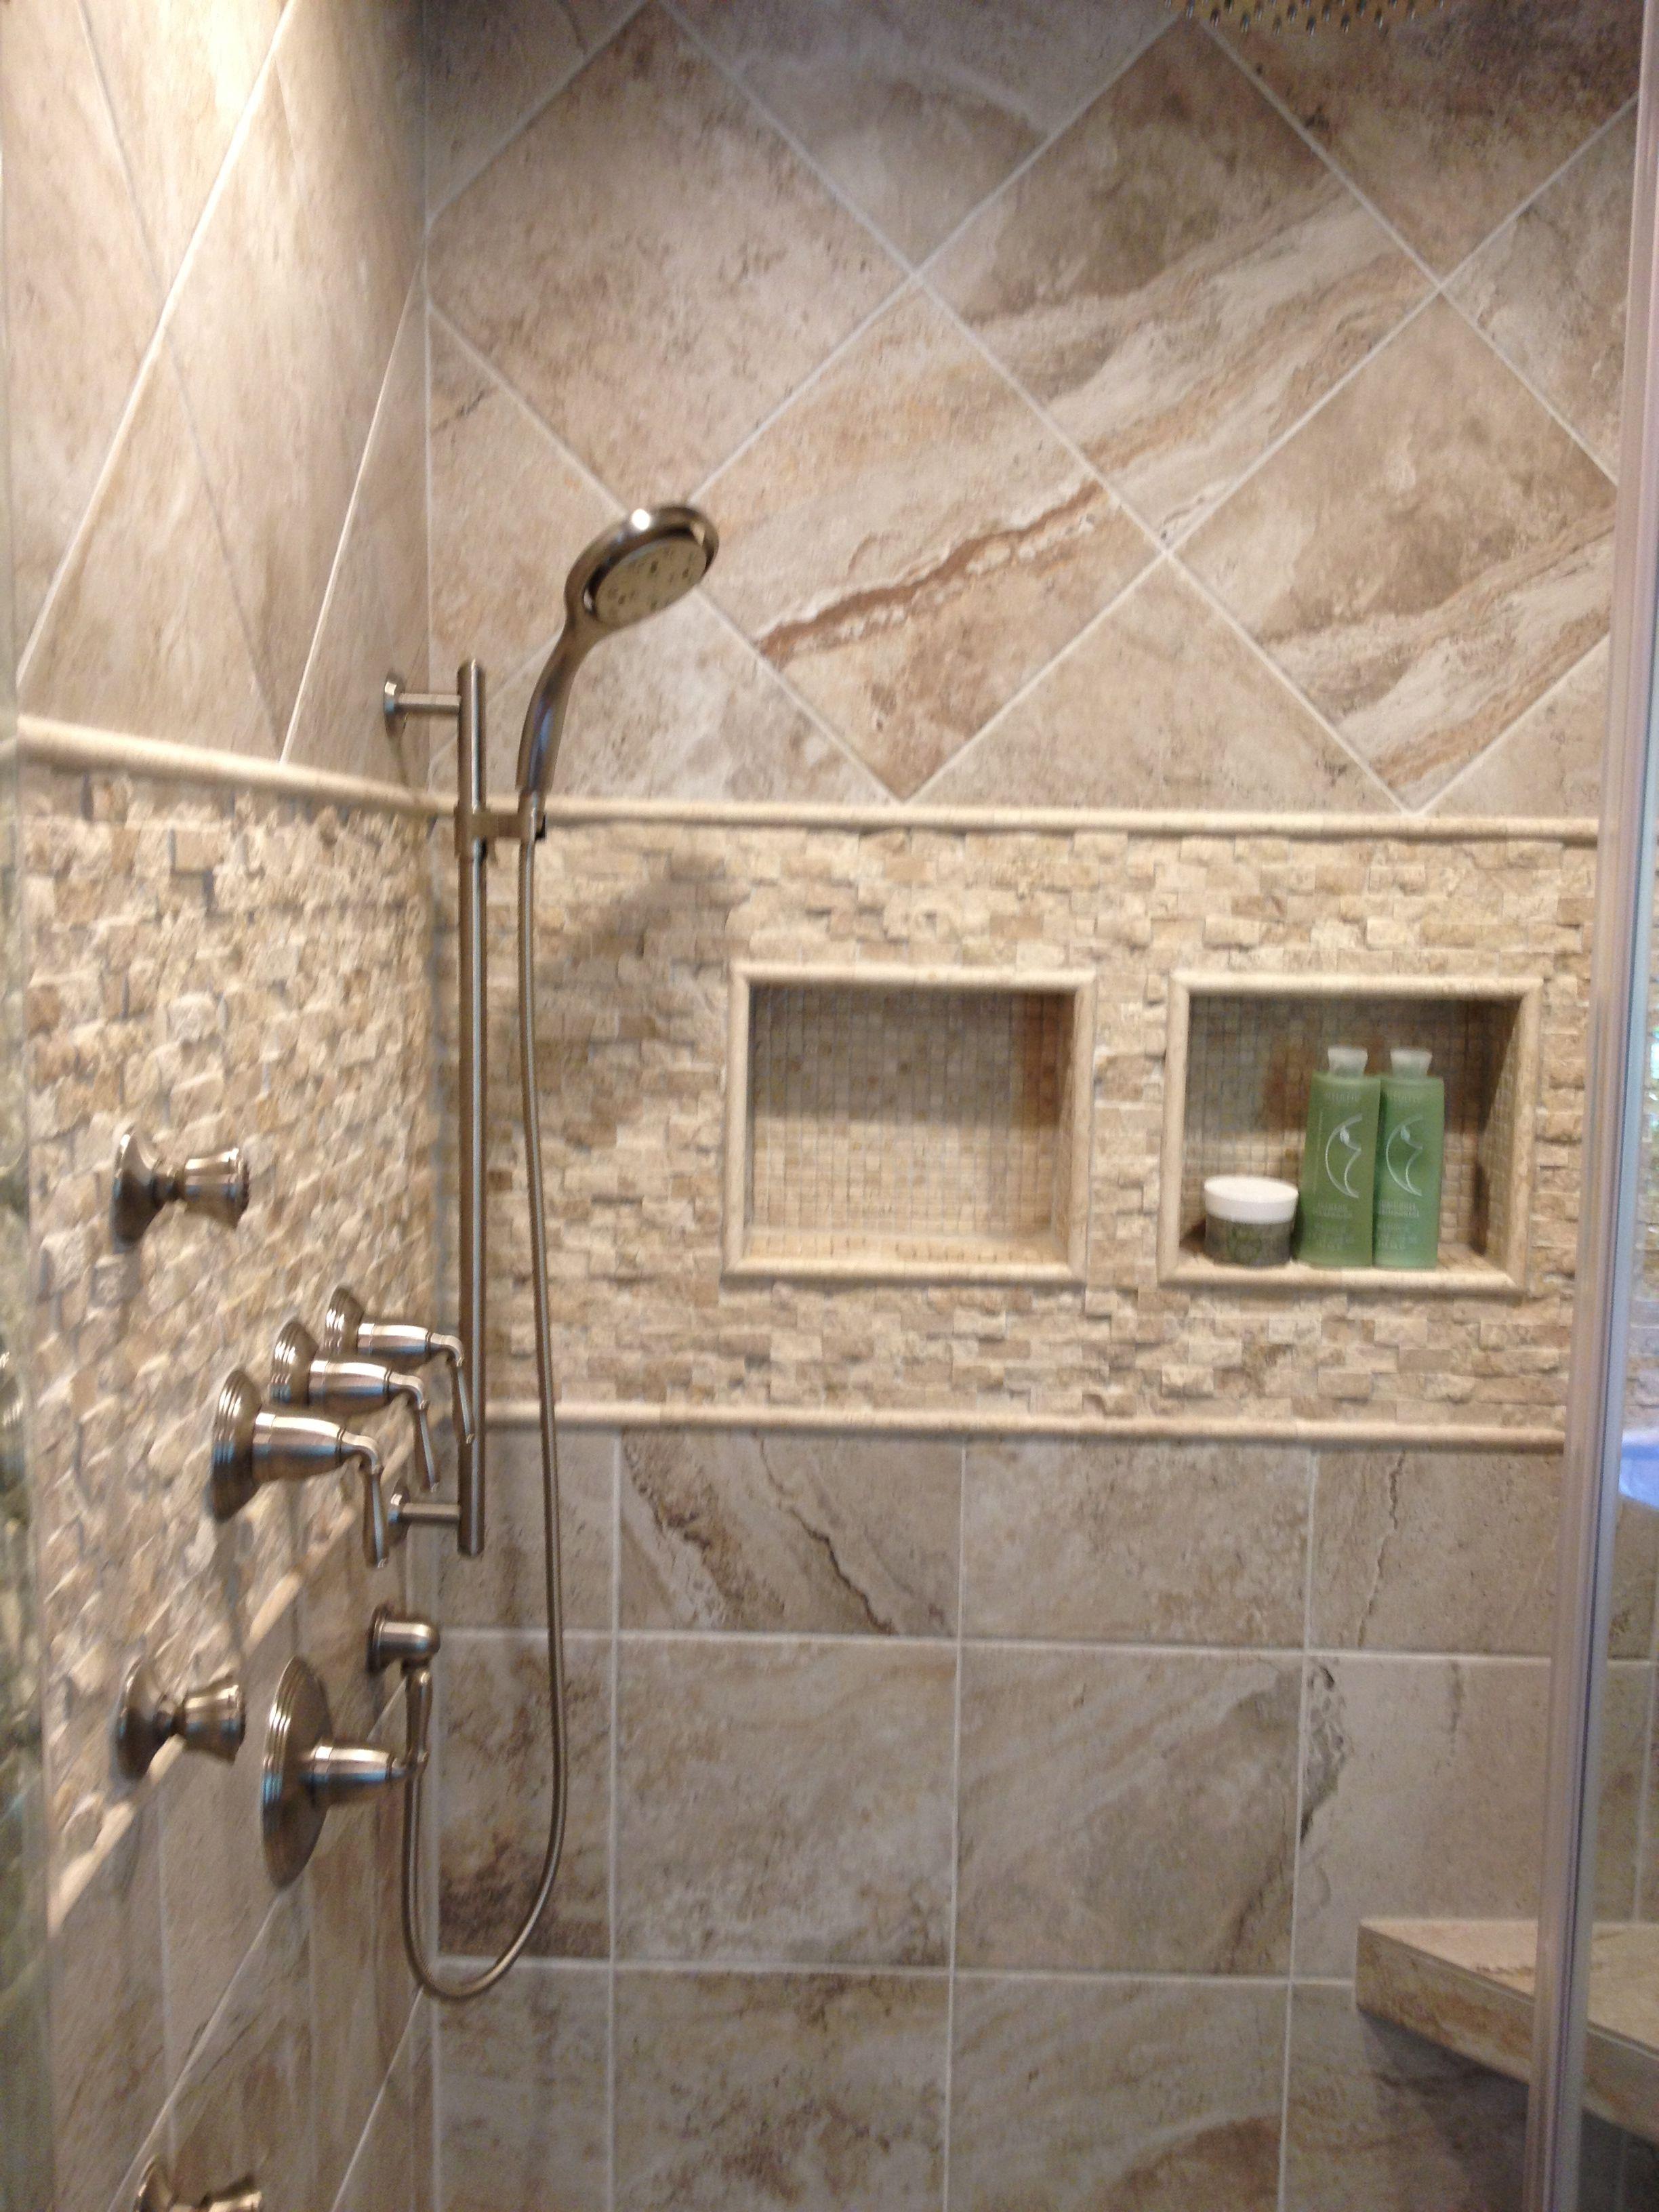 Mikonos Coral Sand Porcelain Tiles Installed In A Shower